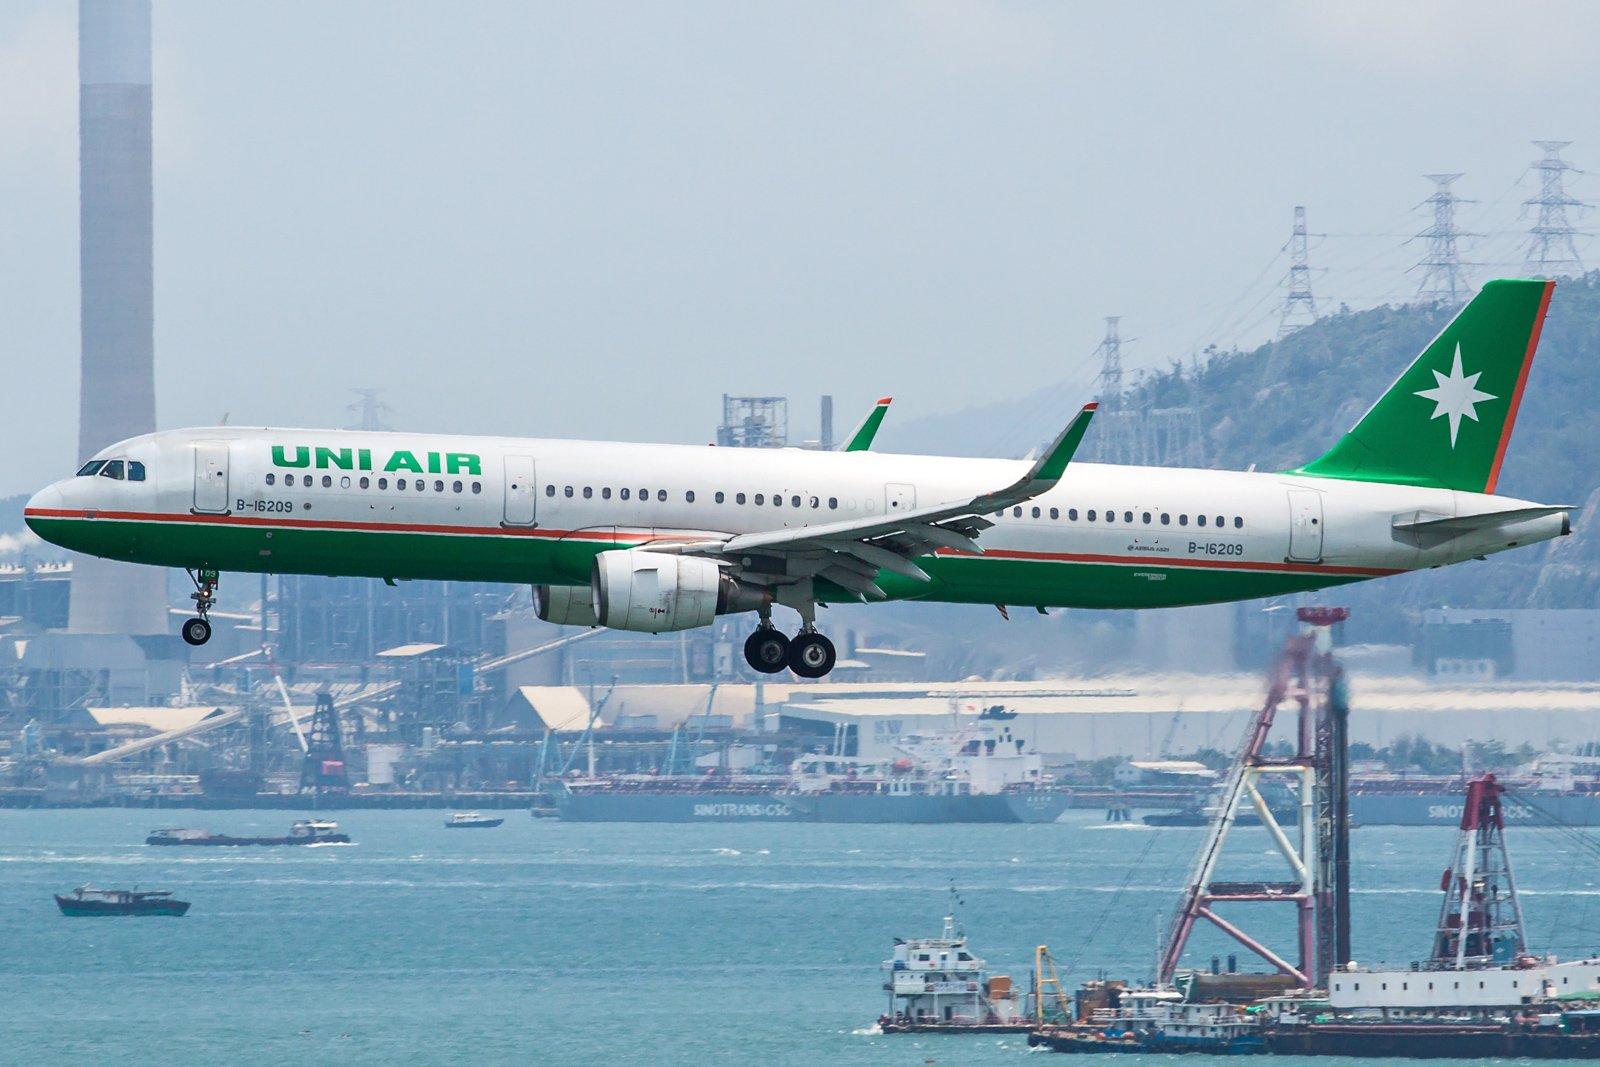 UNI Airways Airbus A321-211(WL) B-16209